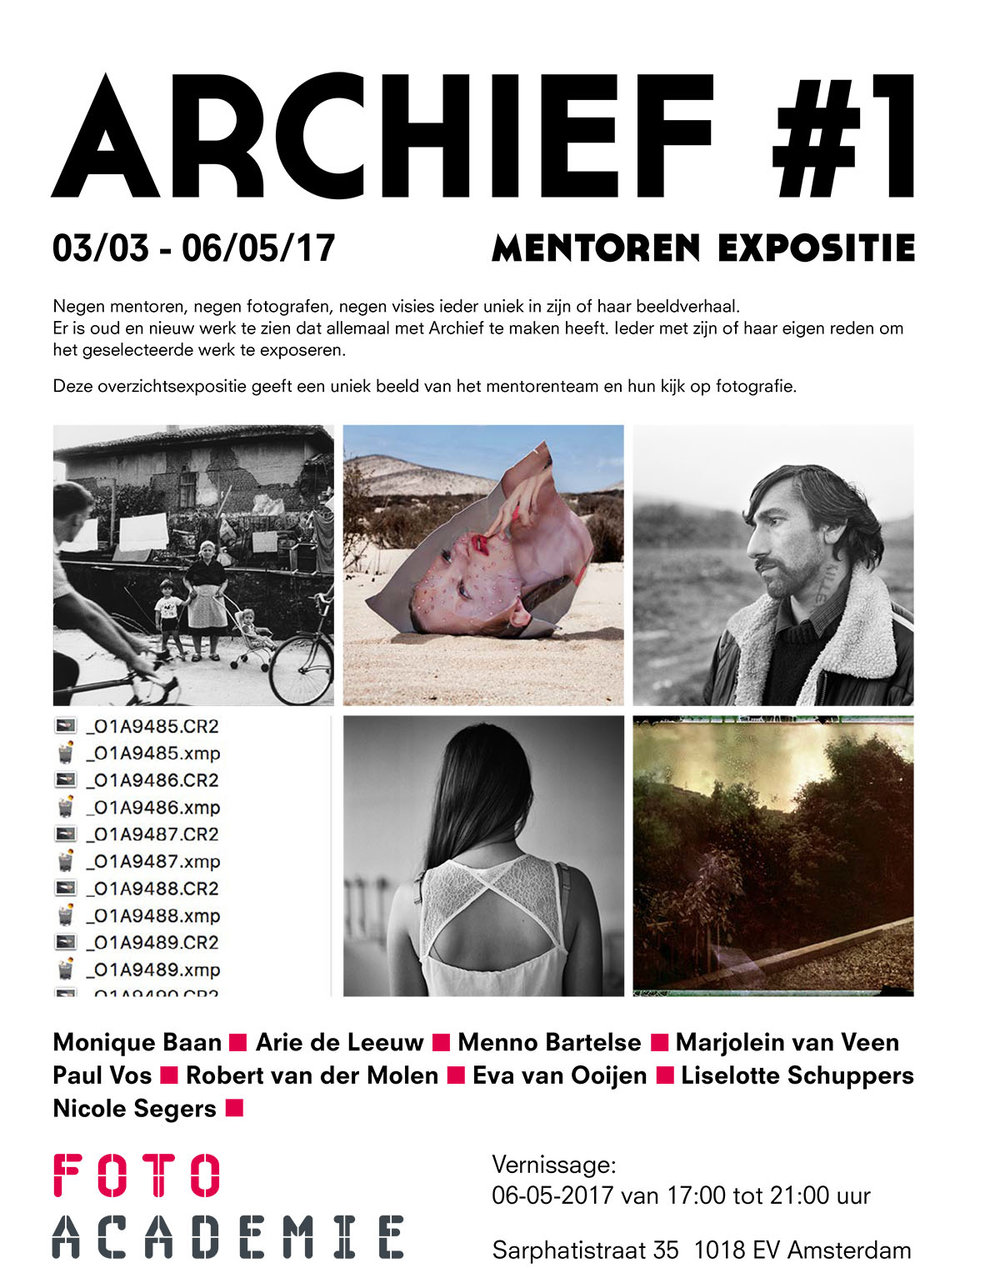 Mentorenexposititie Archied #1